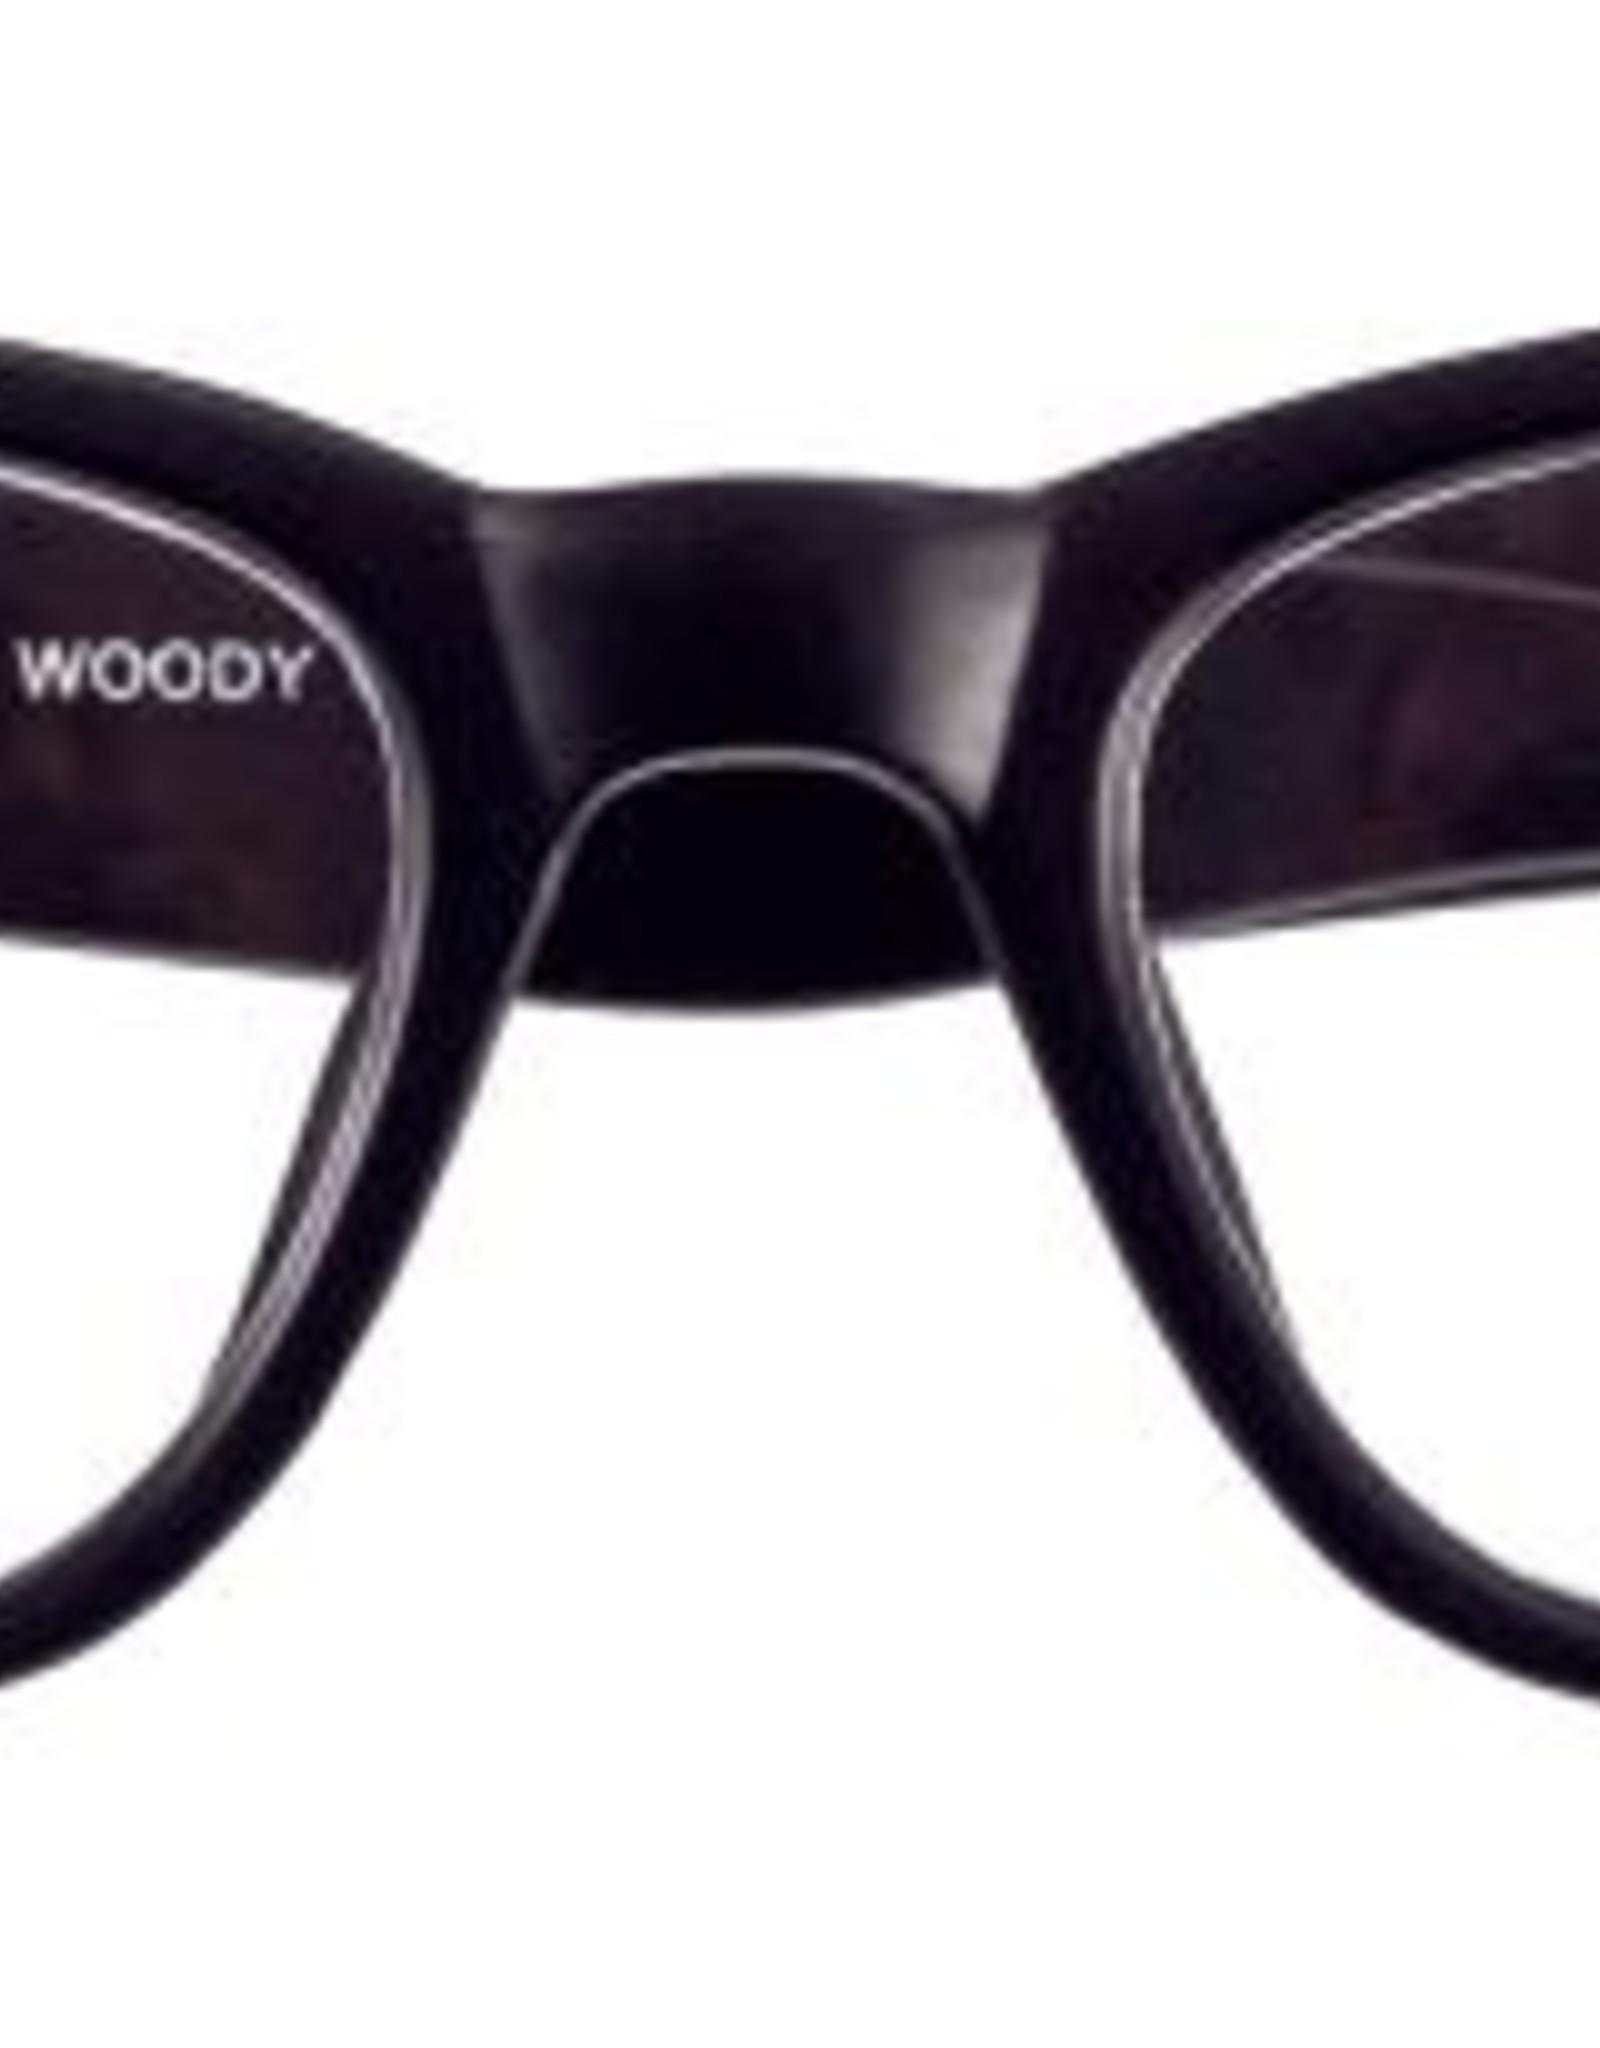 Woody Komplettpreis